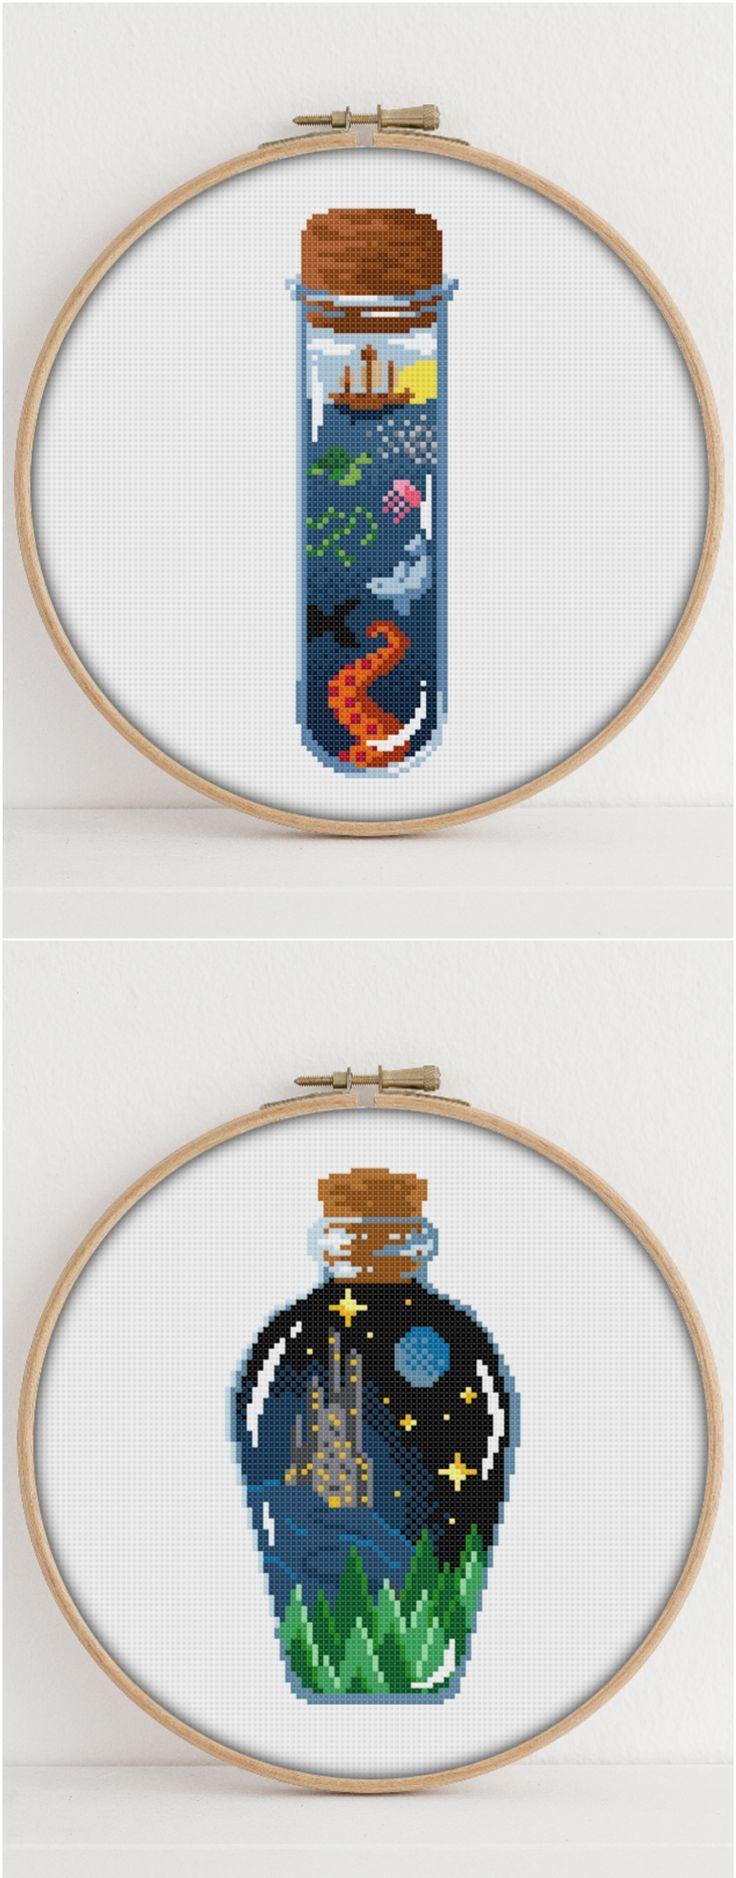 Photo of Magic Bottle Cross Stitch – Fairy Tale – Ocean #kreuzstich #krossstichmuster